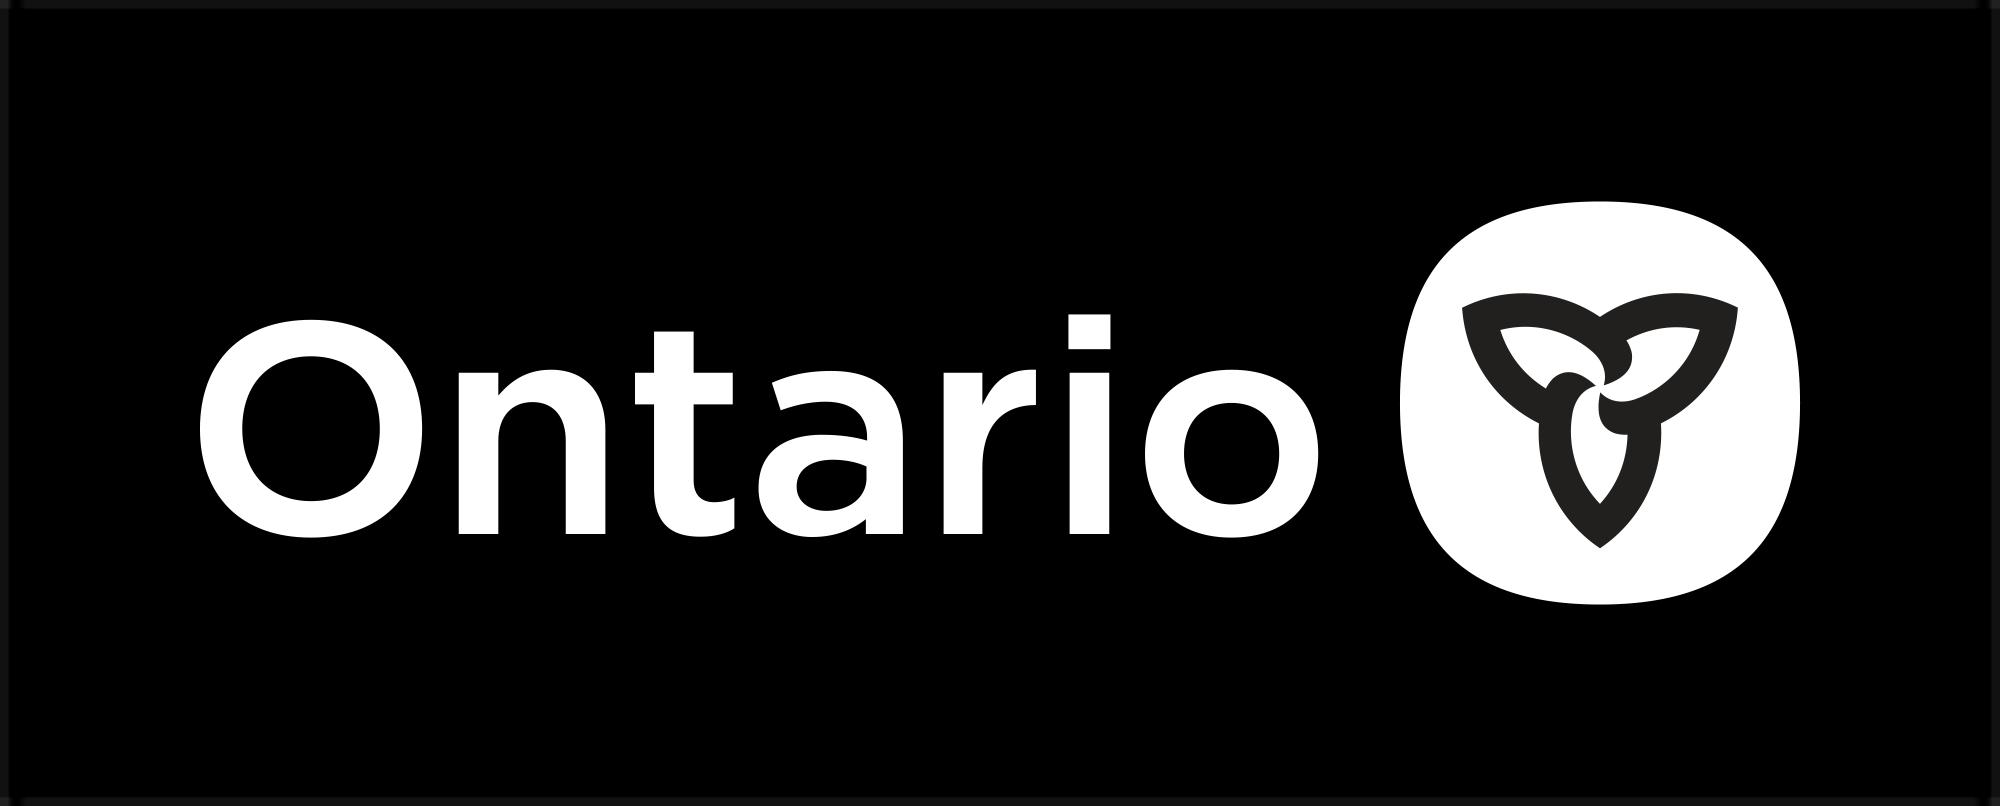 New Logo for Ontario